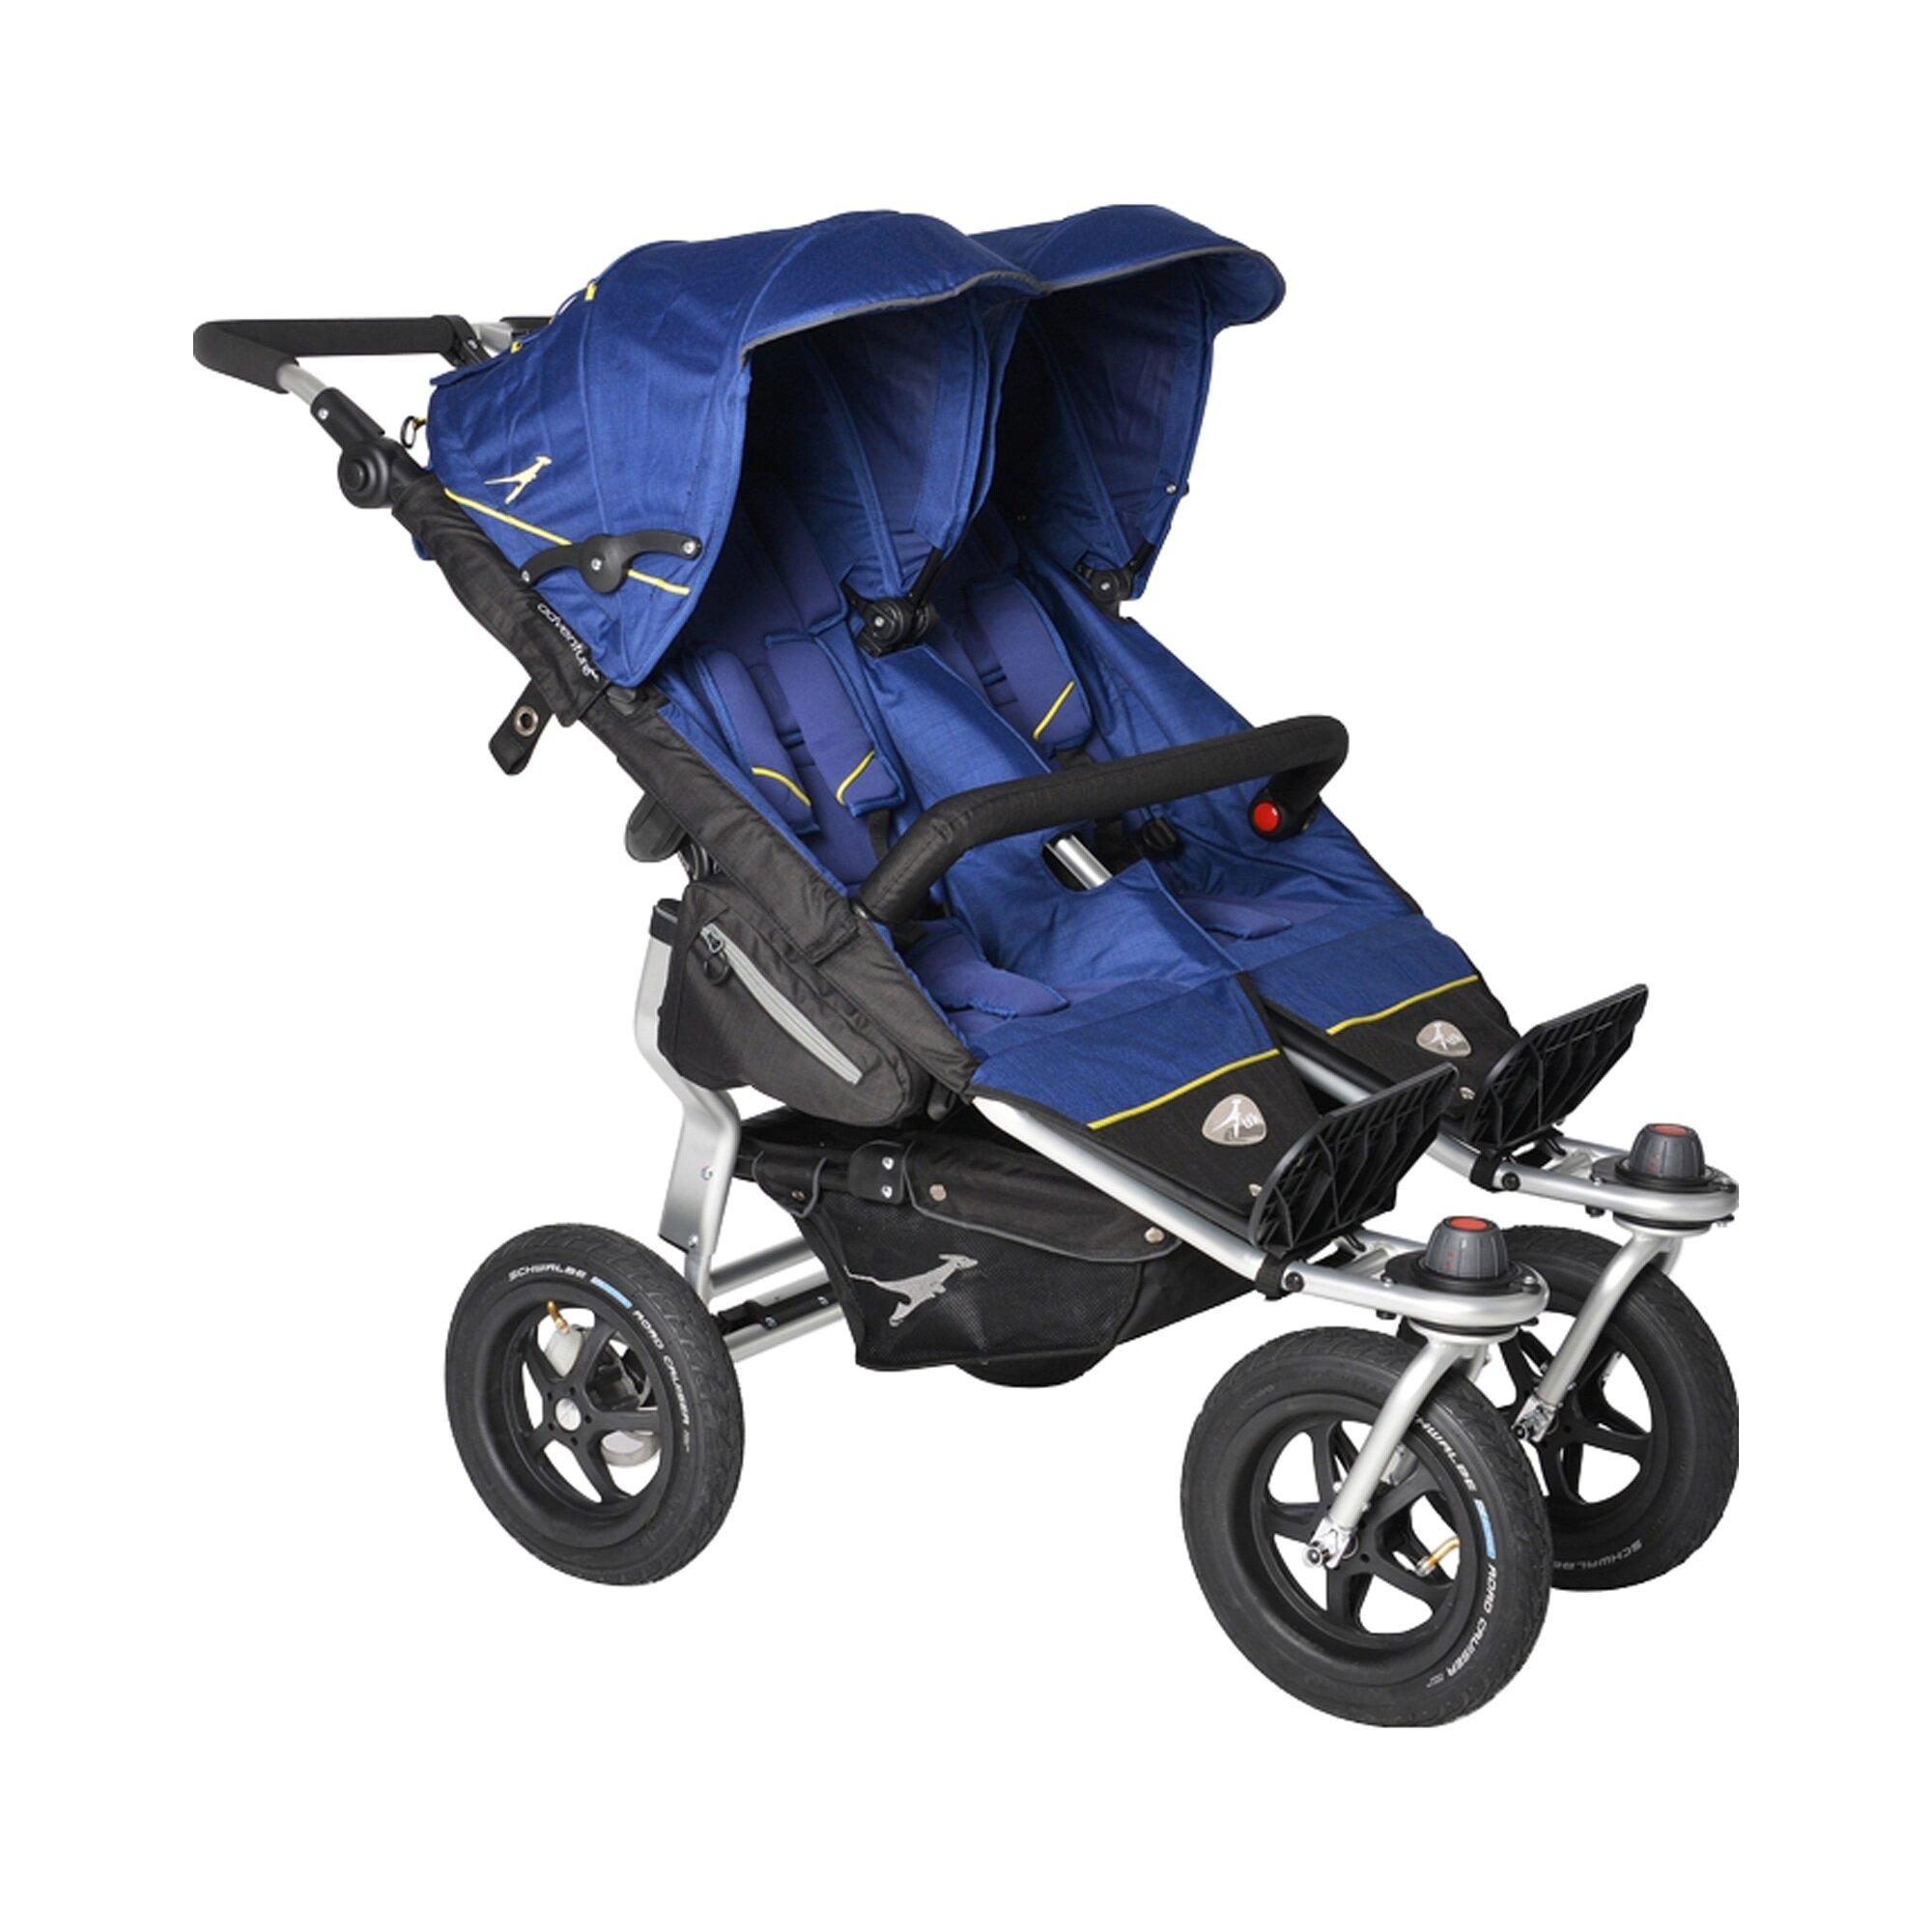 tfk-twin-adventure-kinderwagen-zwillingswagen-blau